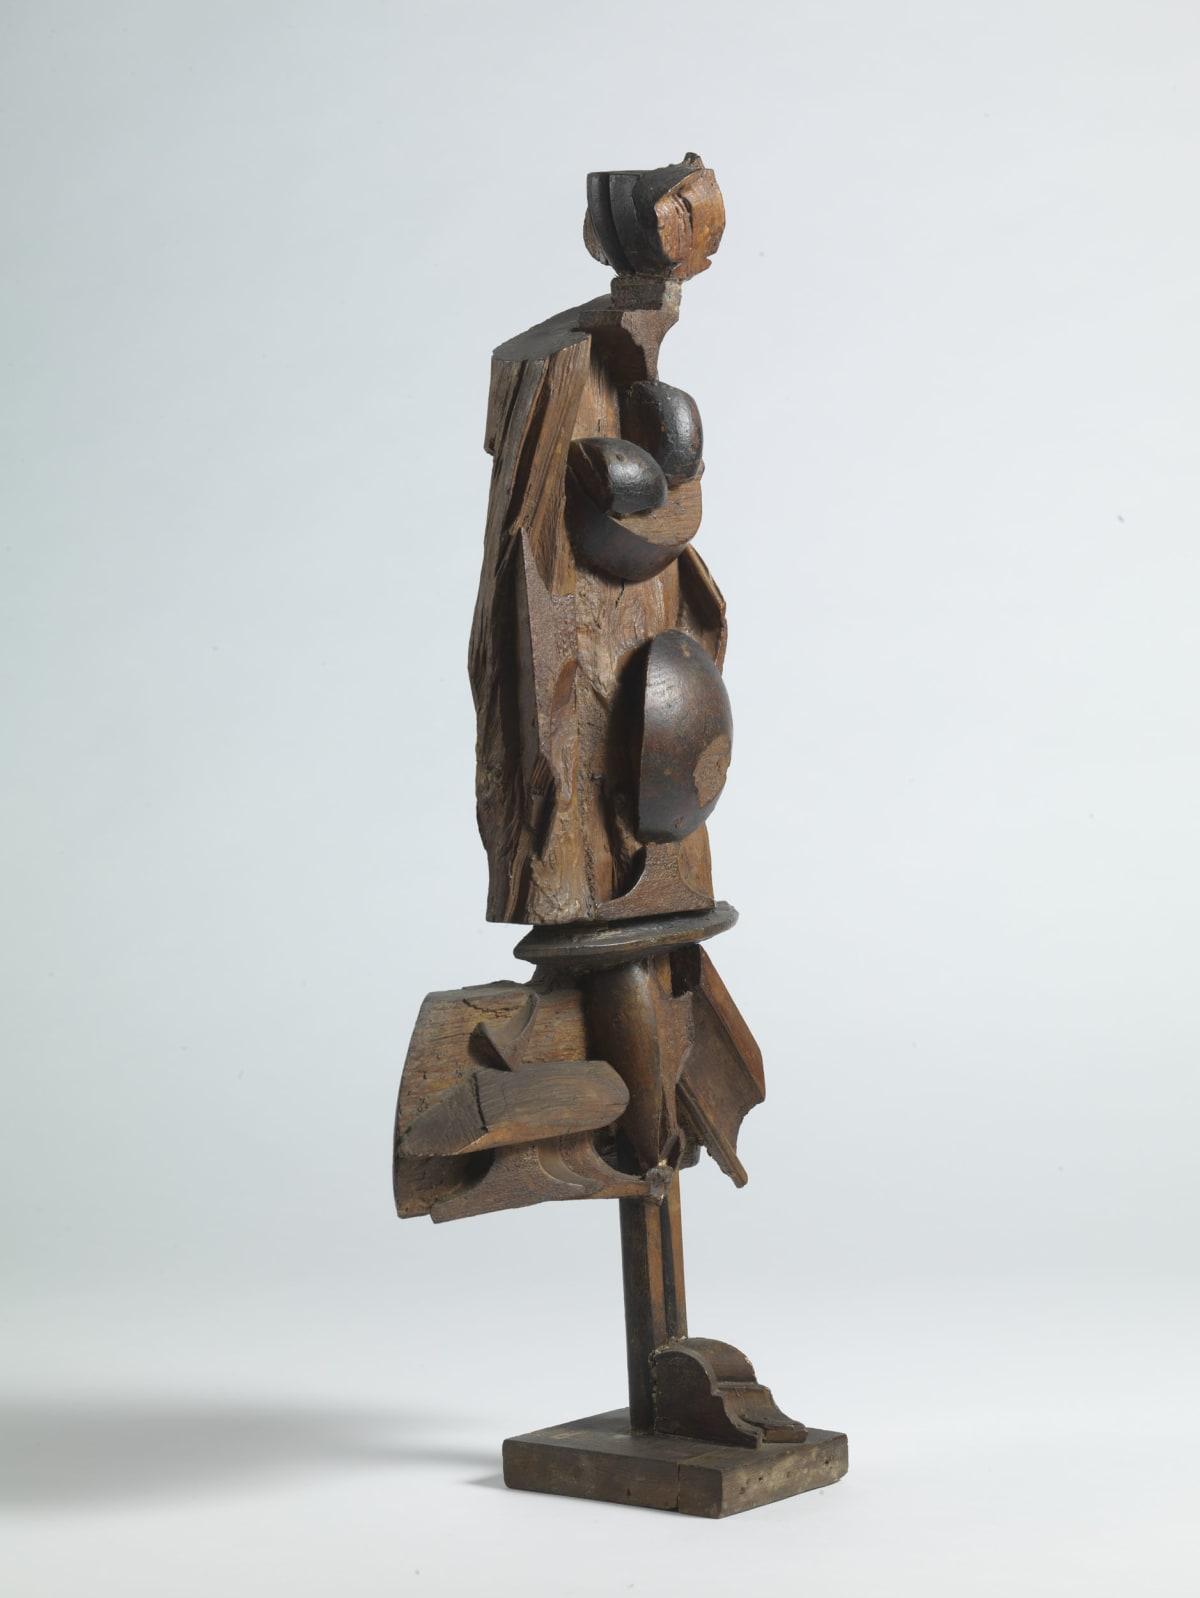 George Fullard, Pregnant Woman, 1959